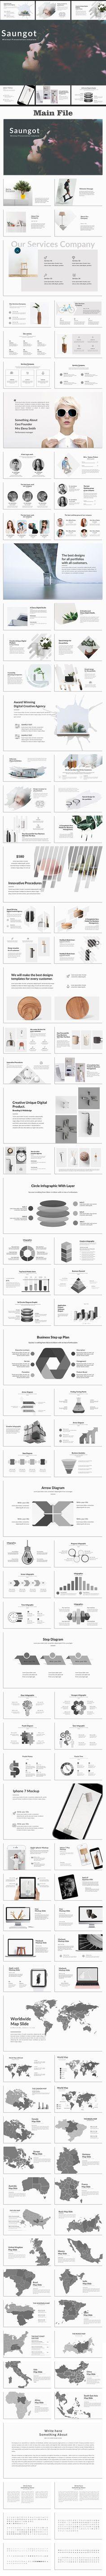 Saungot Minimal #PowerPoint Template - Creative PowerPoint #Templates Download here: https://graphicriver.net/item/saungot-minimal-powerpoint-template/20332974?ref=alena994